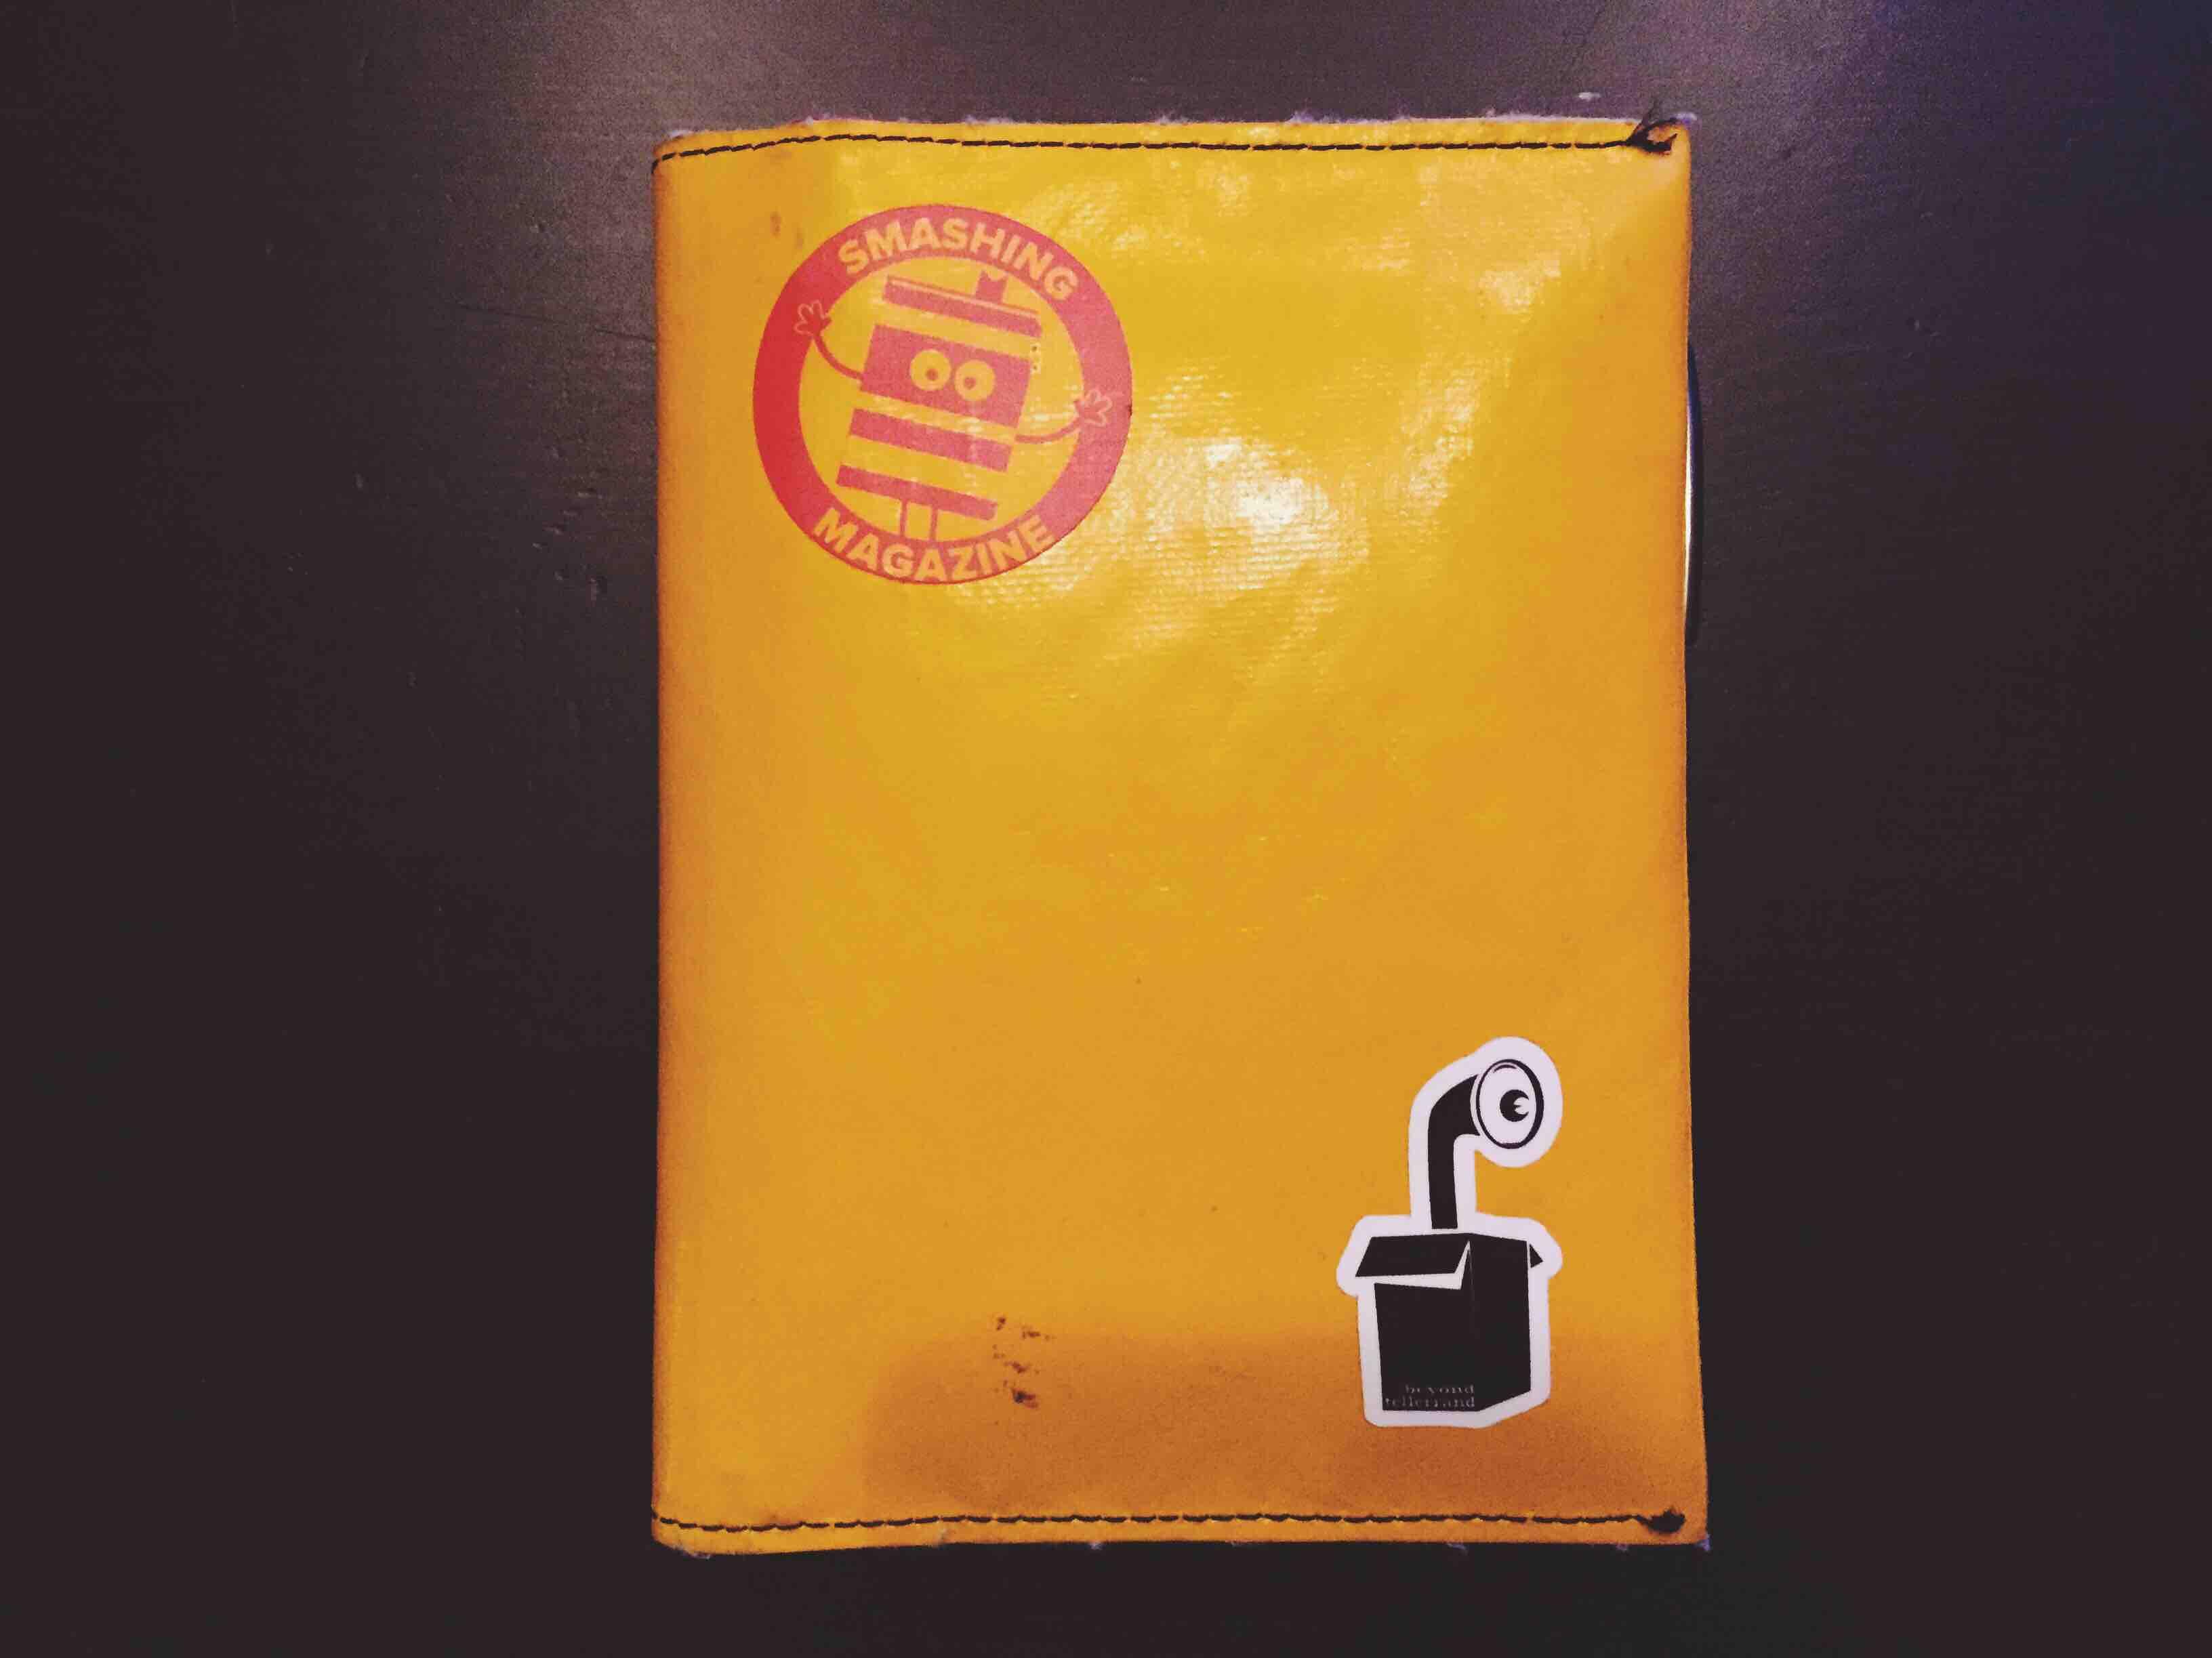 My Freitag notebook